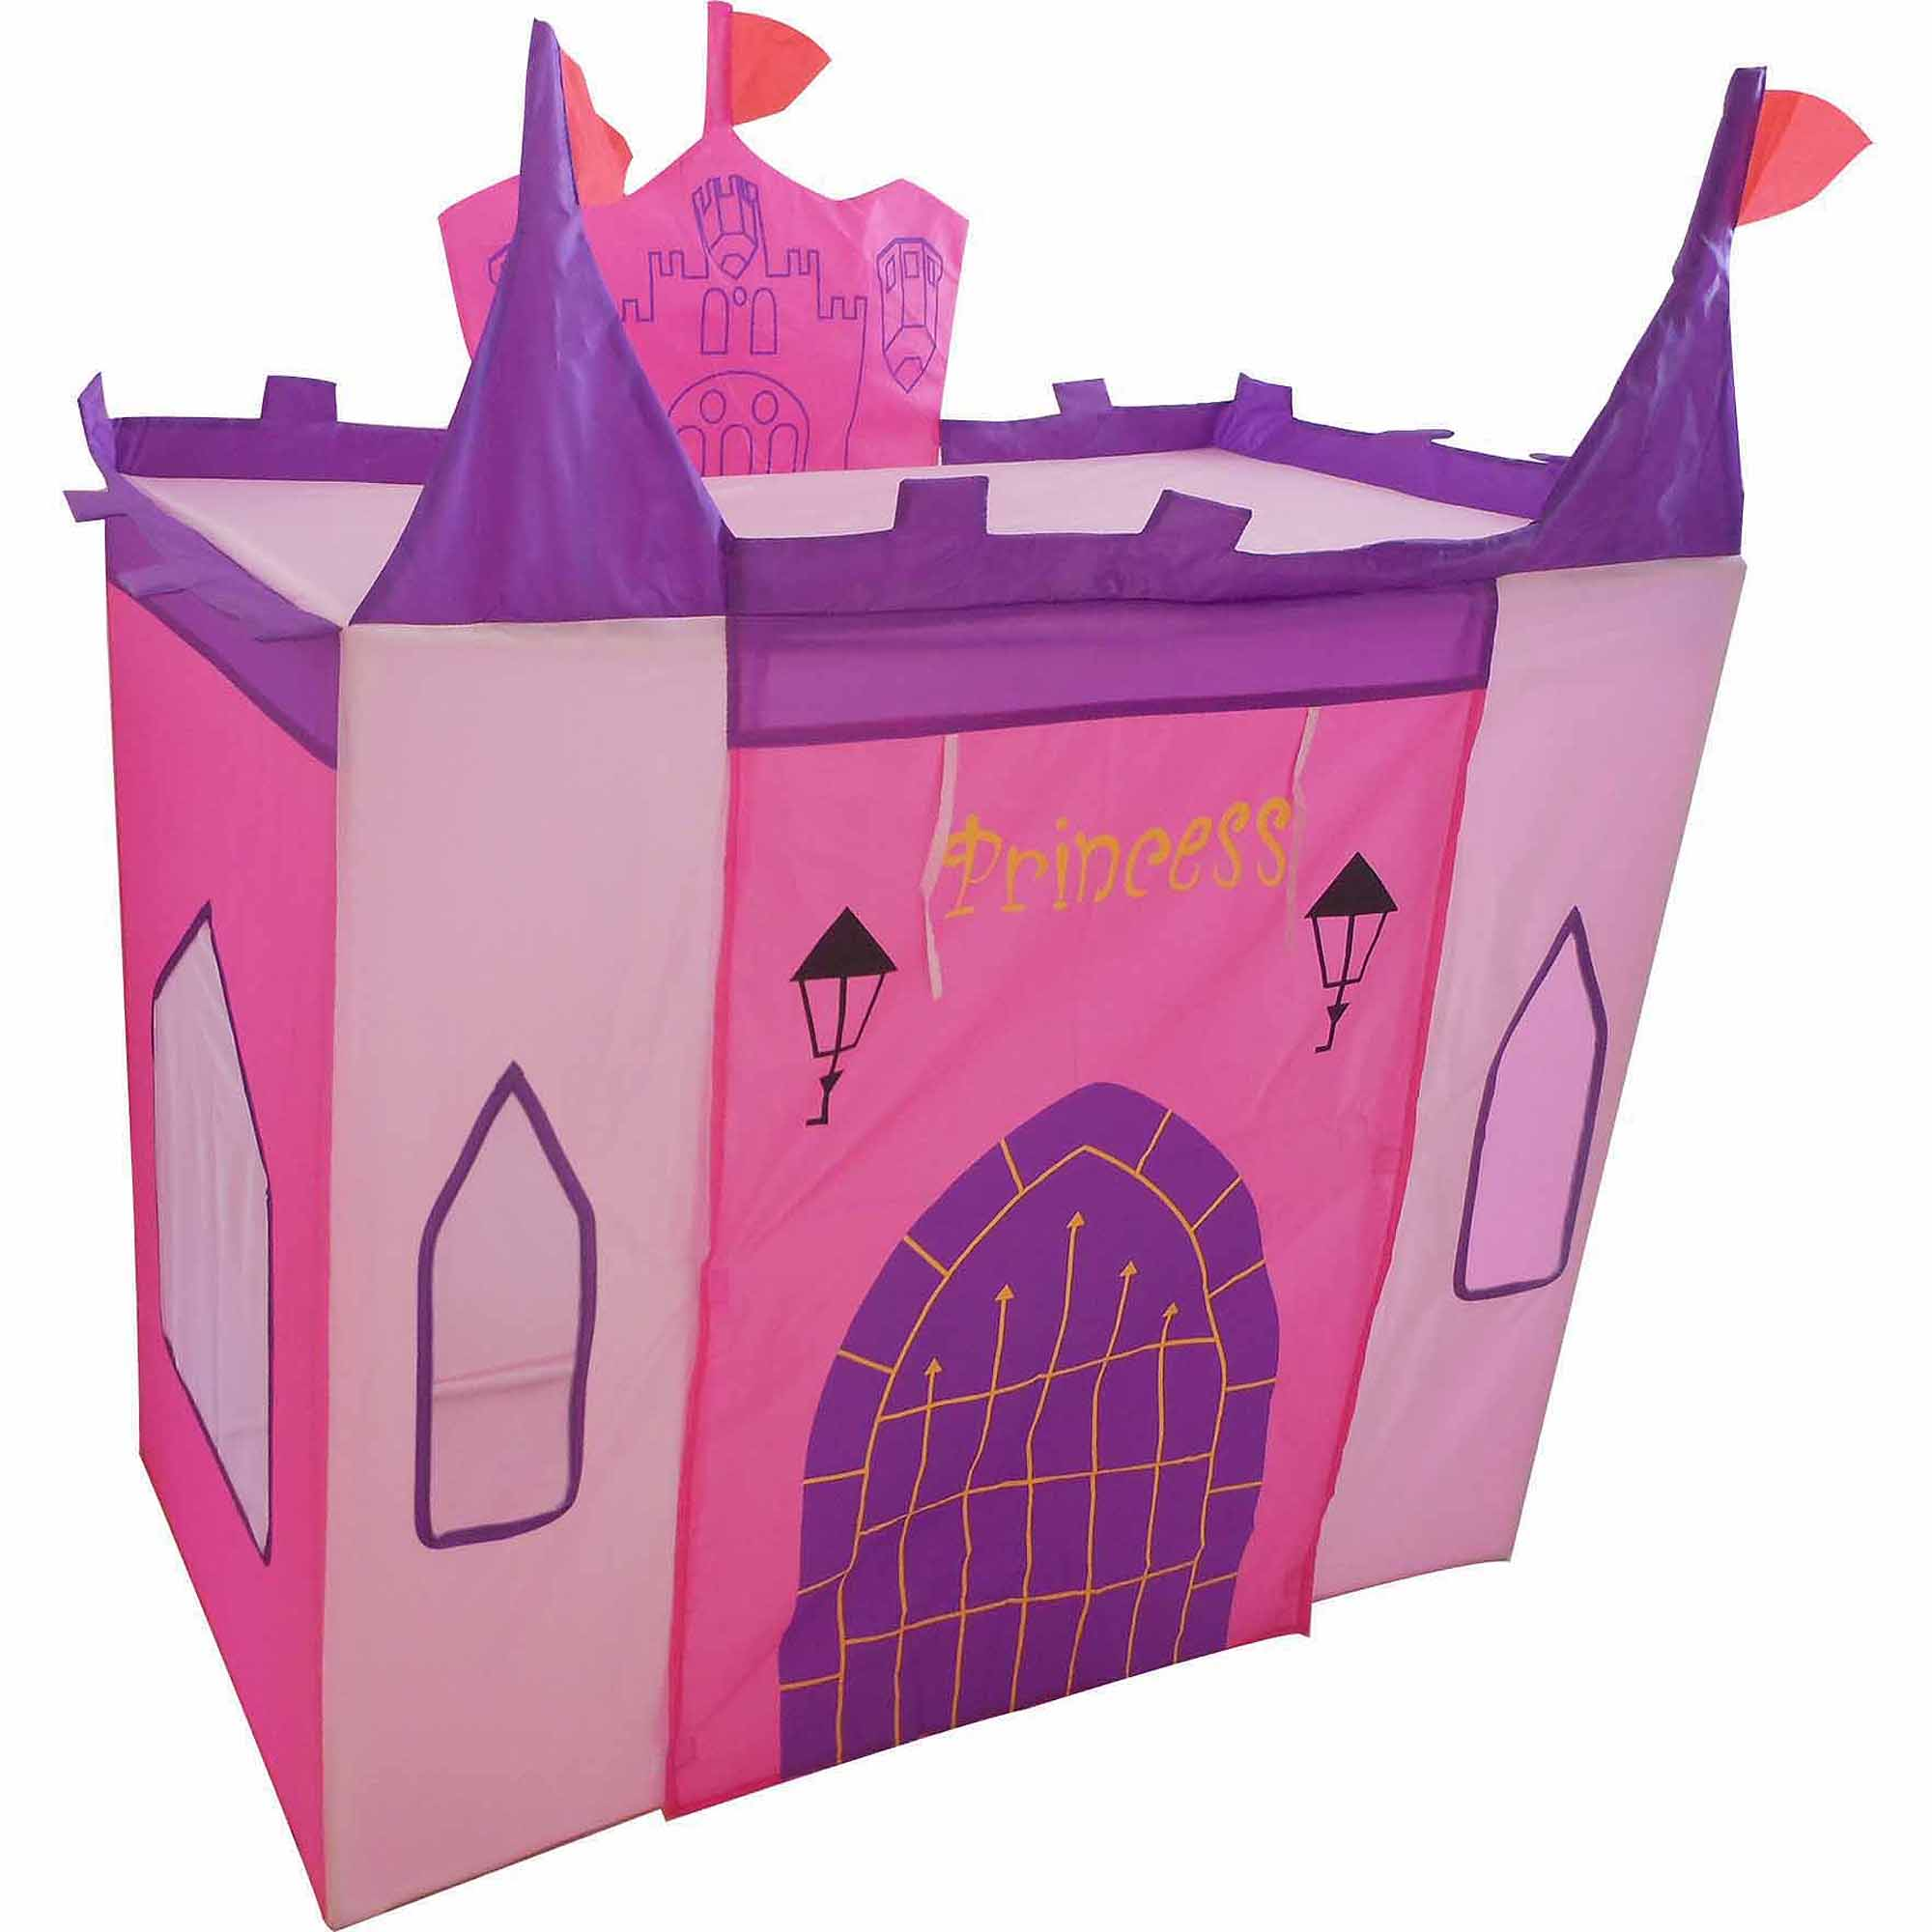 enchanted princess castle play tent - walmart